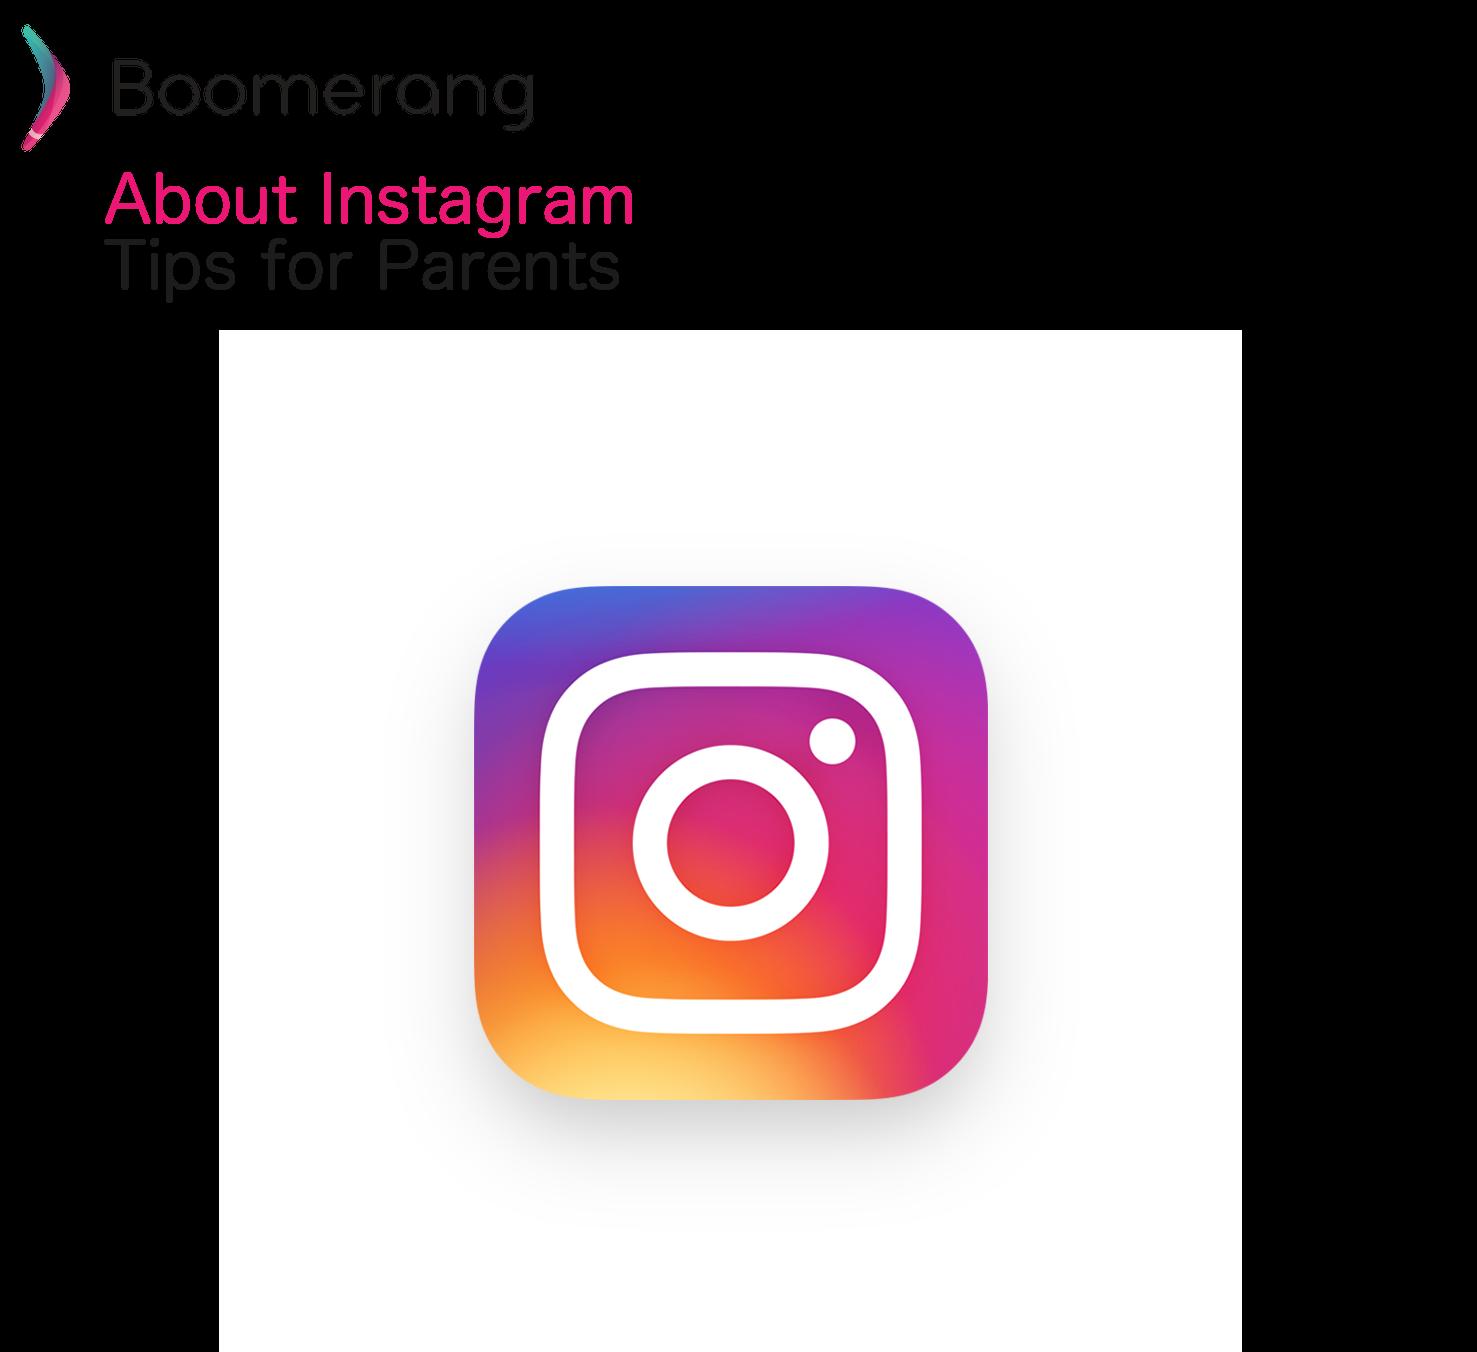 About Instagram - Boomerang Parental Control blog